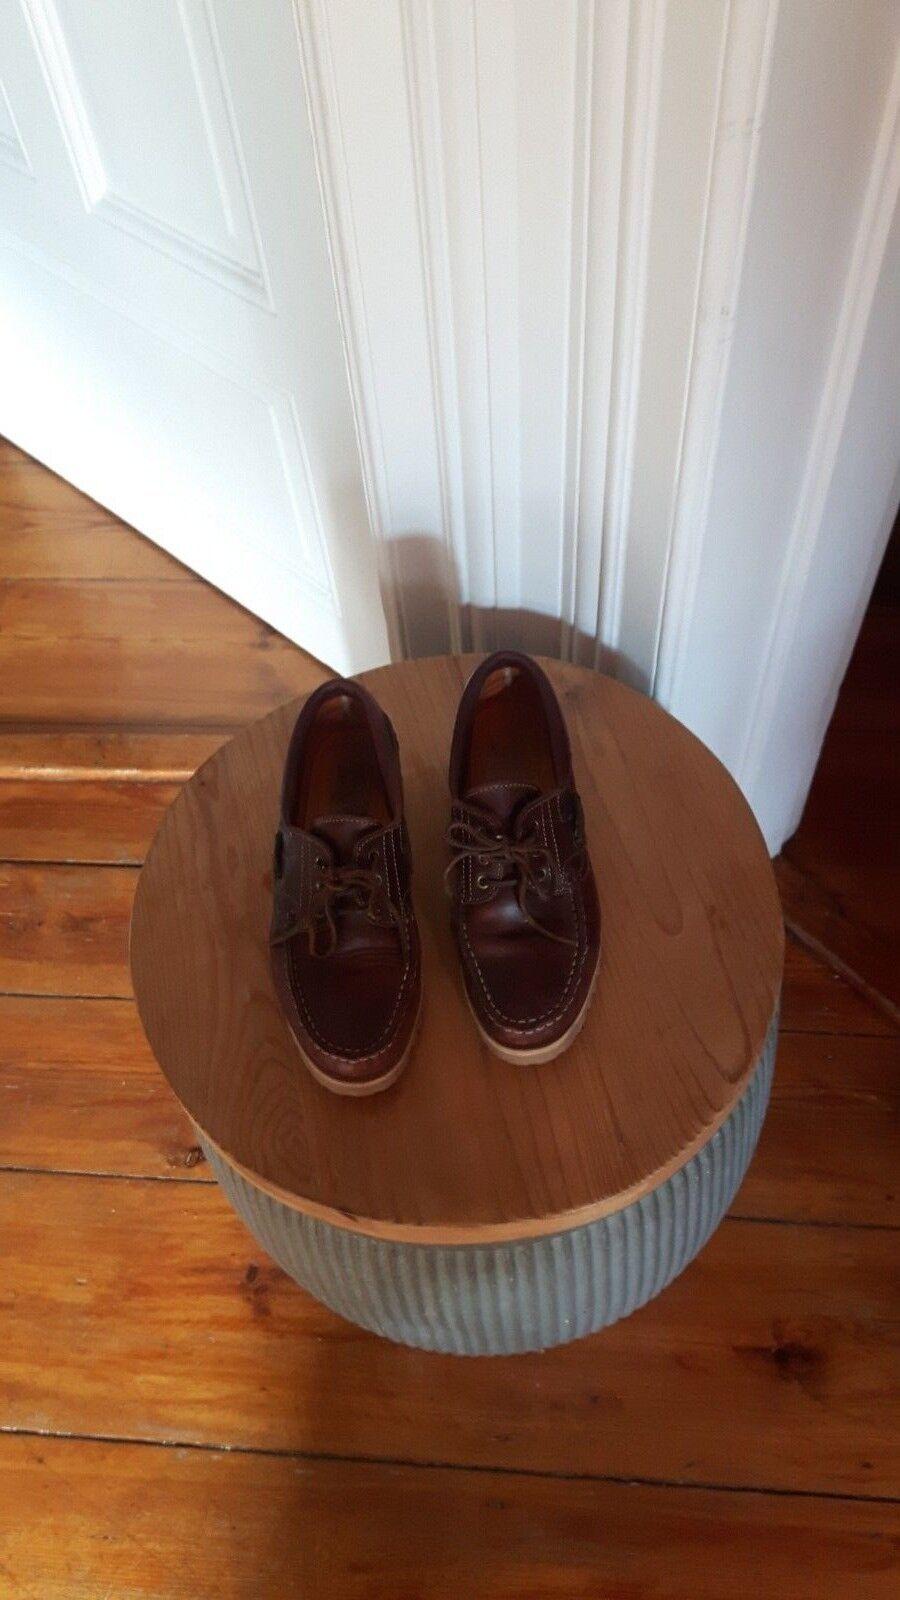 Van Bommel Original Bootsschuhe Leder brown Grösse 40 TOP